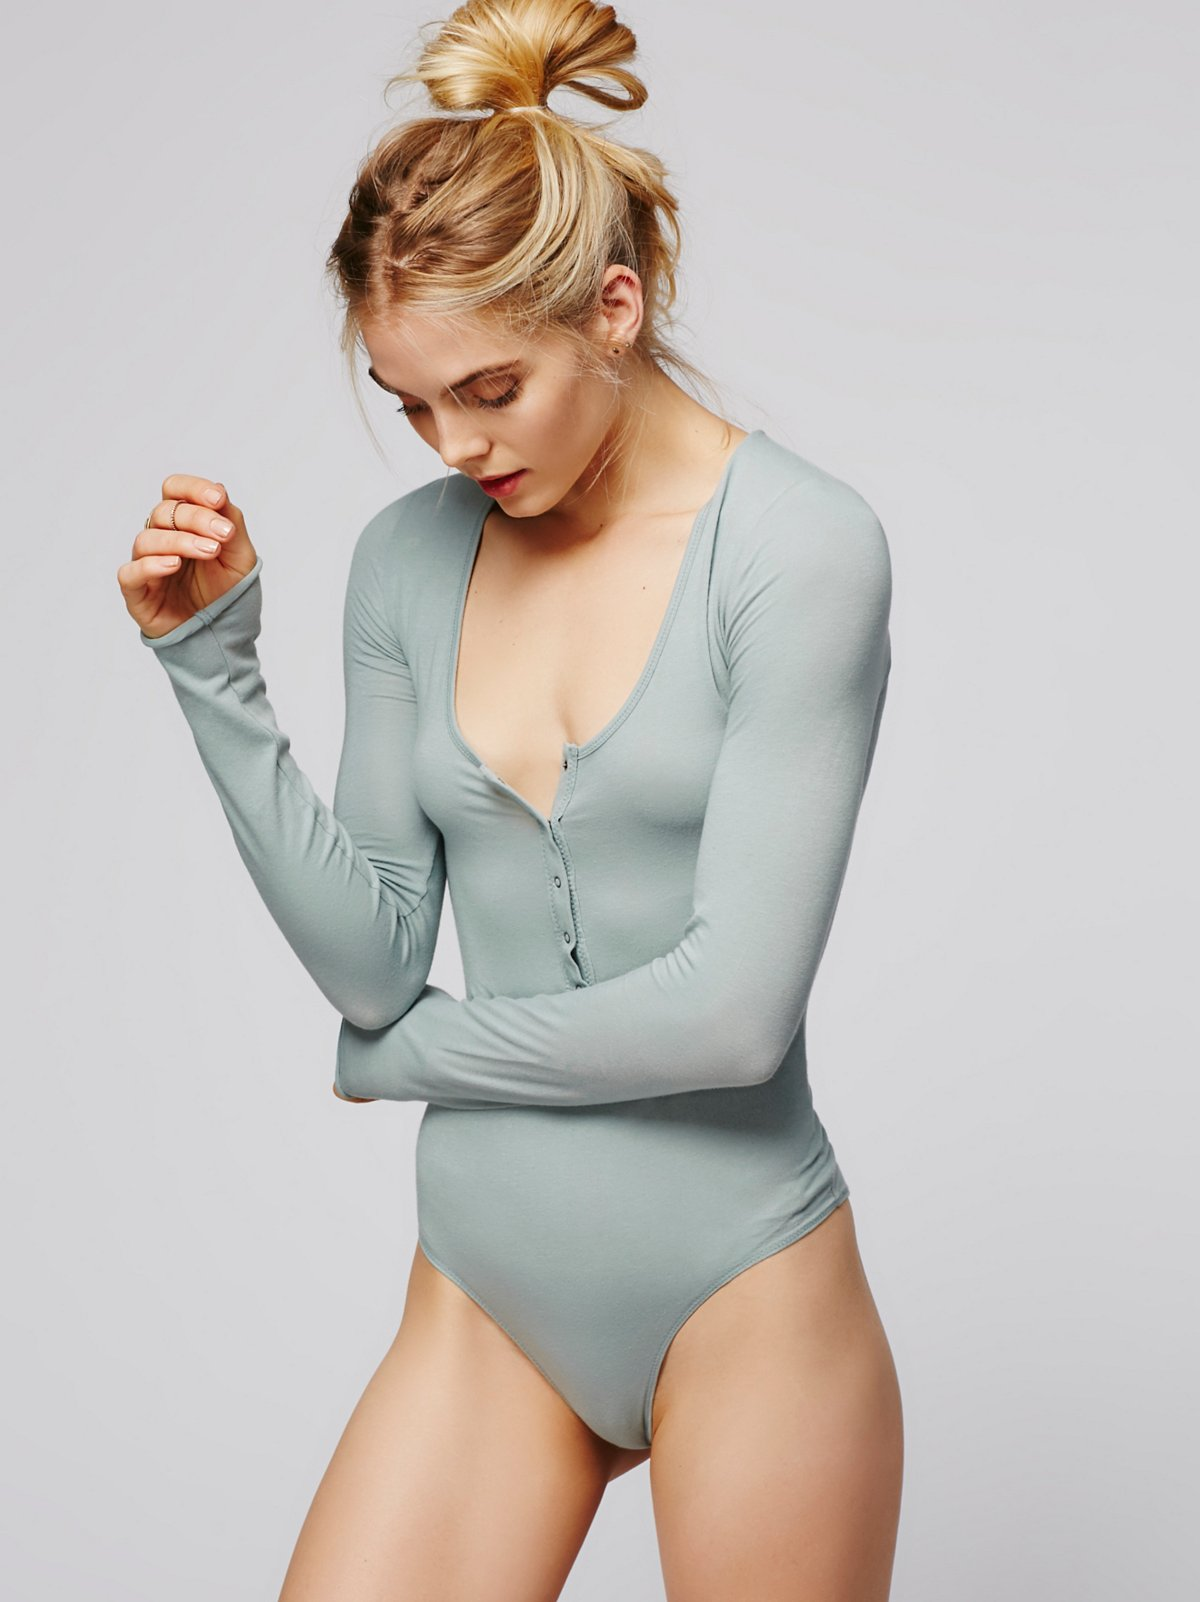 Simply Henley Bodysuit